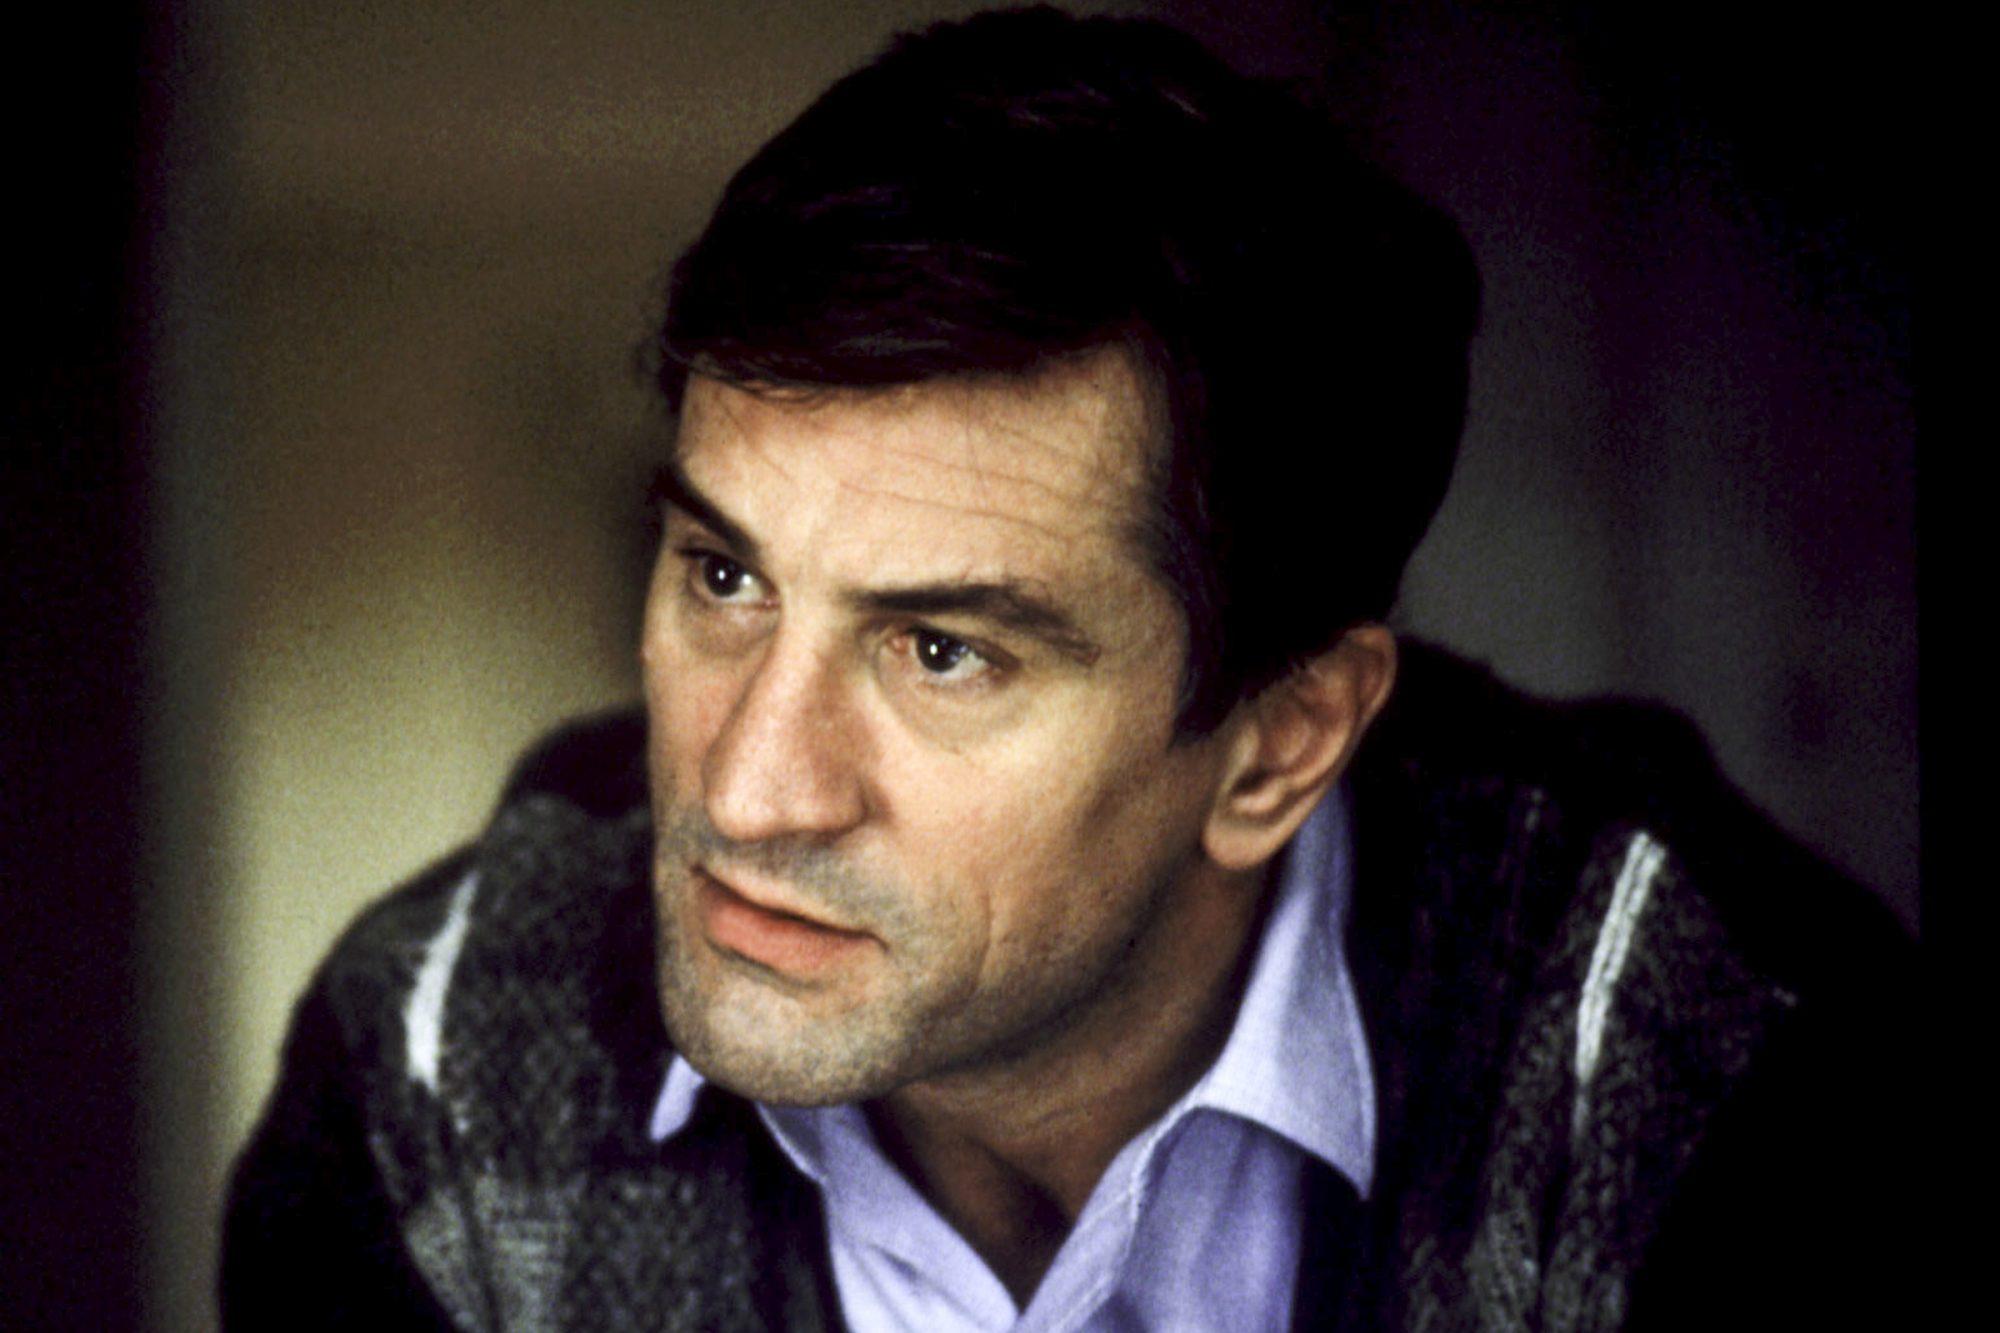 AWAKENINGS, Robert De Niro, 1990